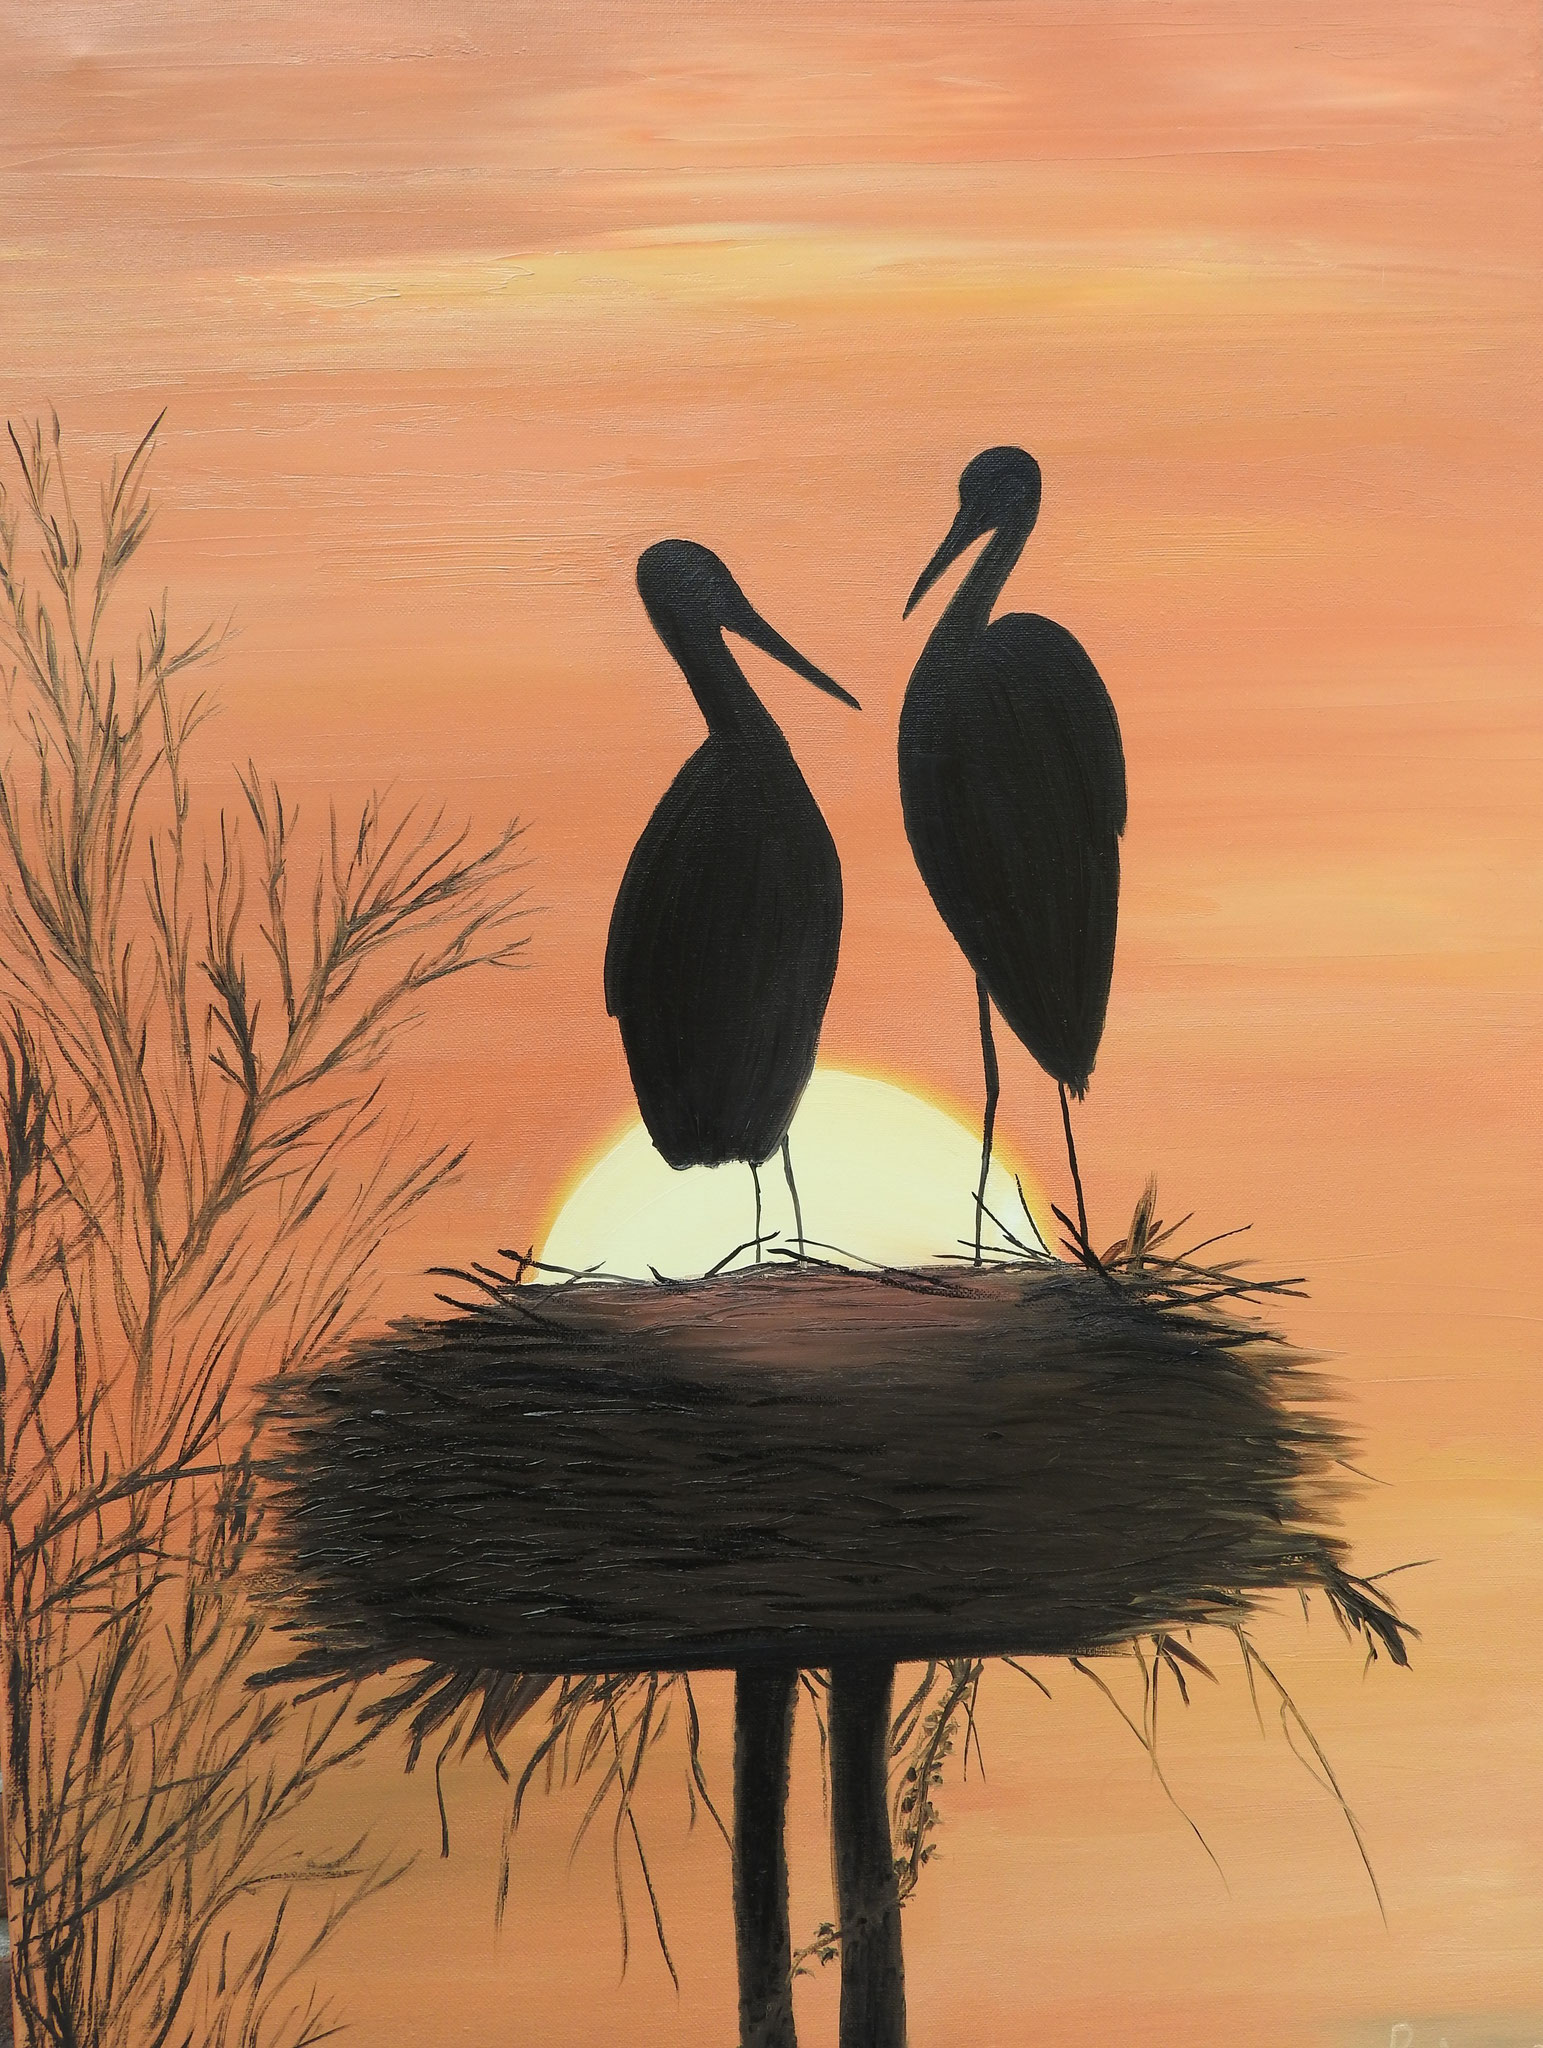 """Storks's Nest""  - oil, canvas 80х60, 2016, Private collection Belgium"